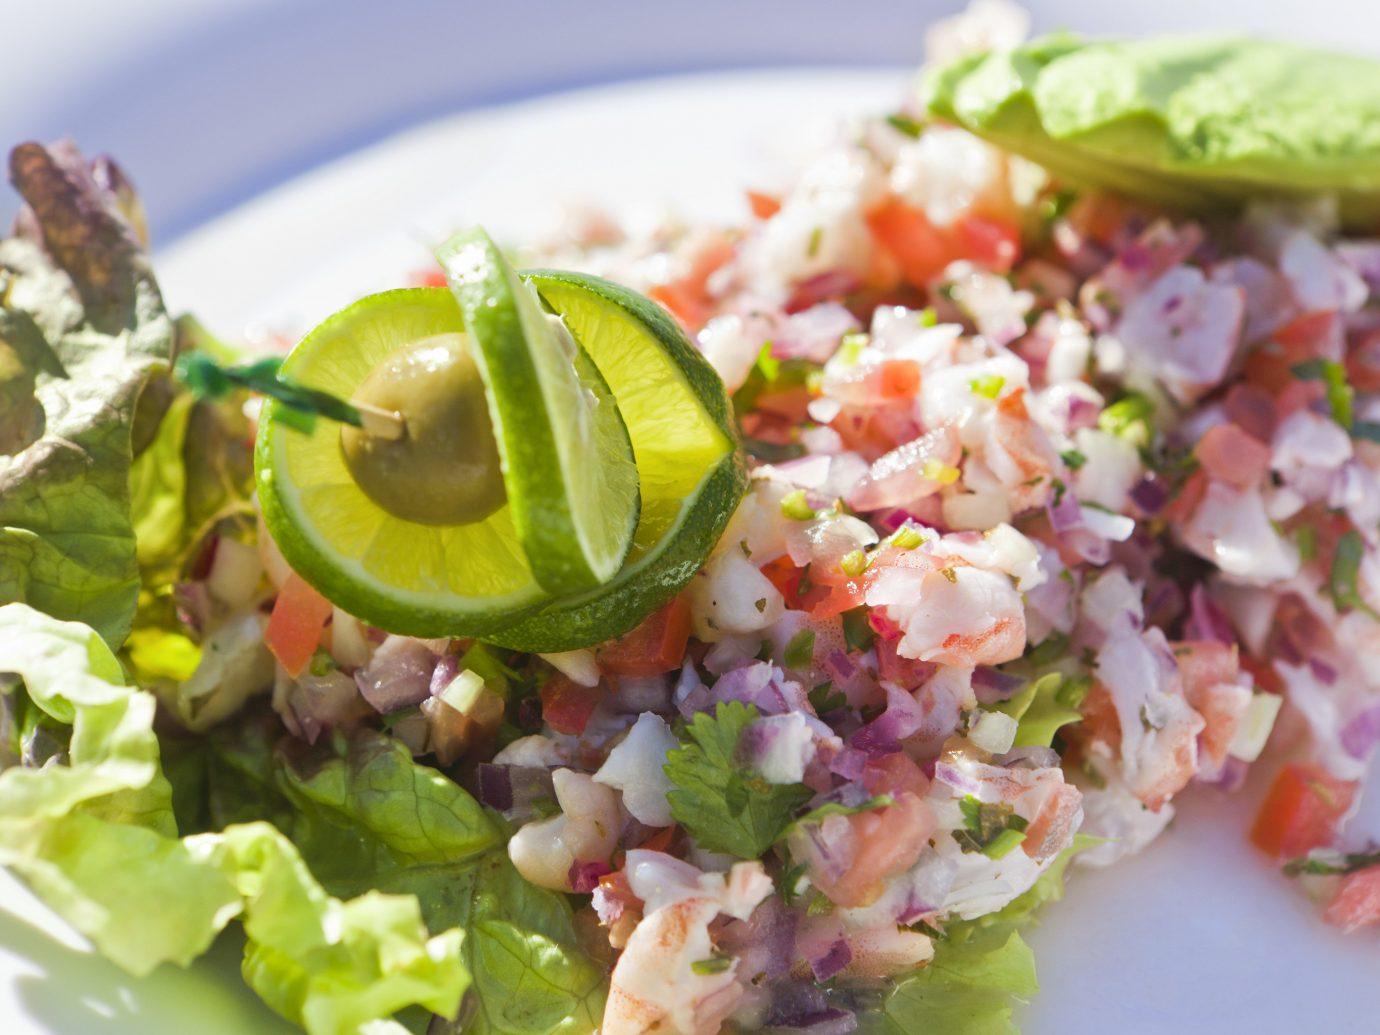 Beach food plate salad dish tuna salad cuisine produce vegetable ceviche greek salad tostada close fried rice toppings